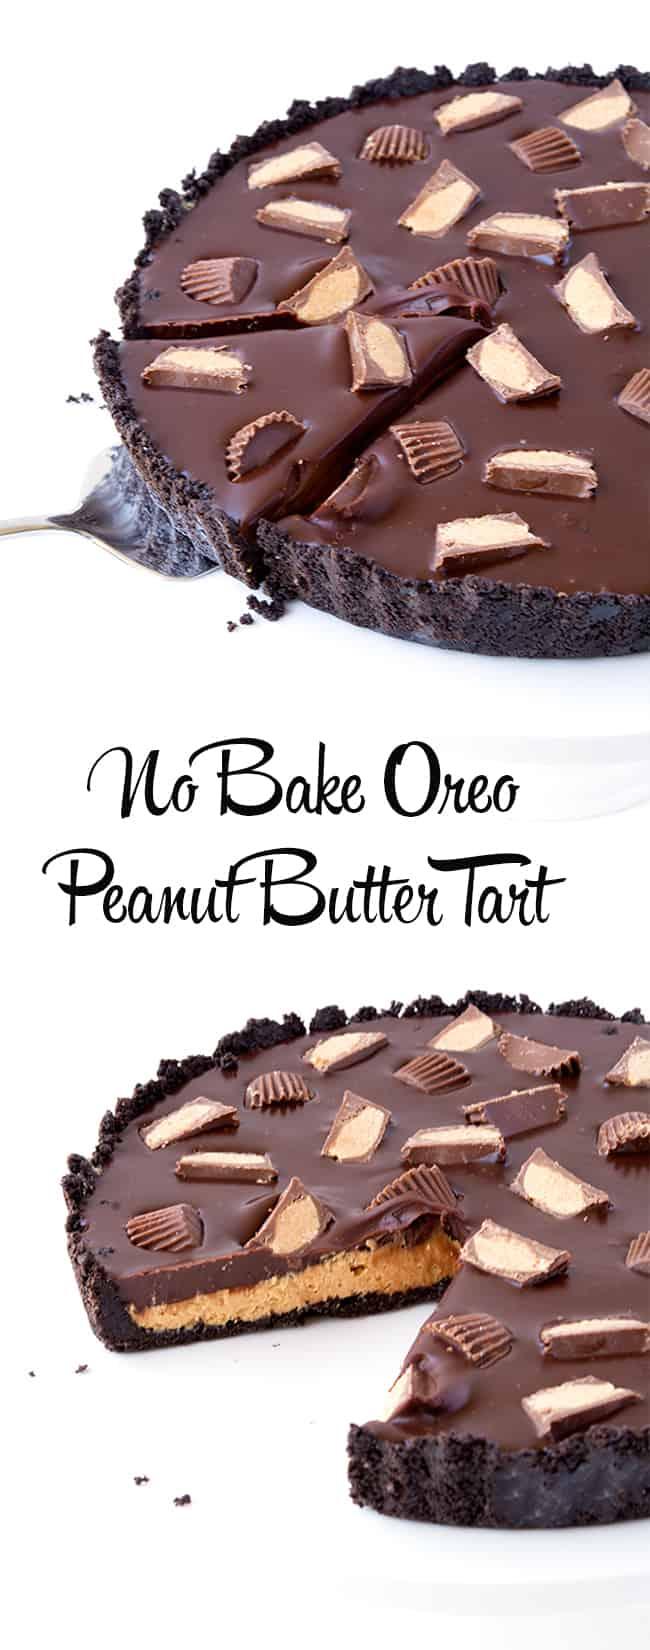 No Bake Oreo Peanut Butter Tart | sweetest menu